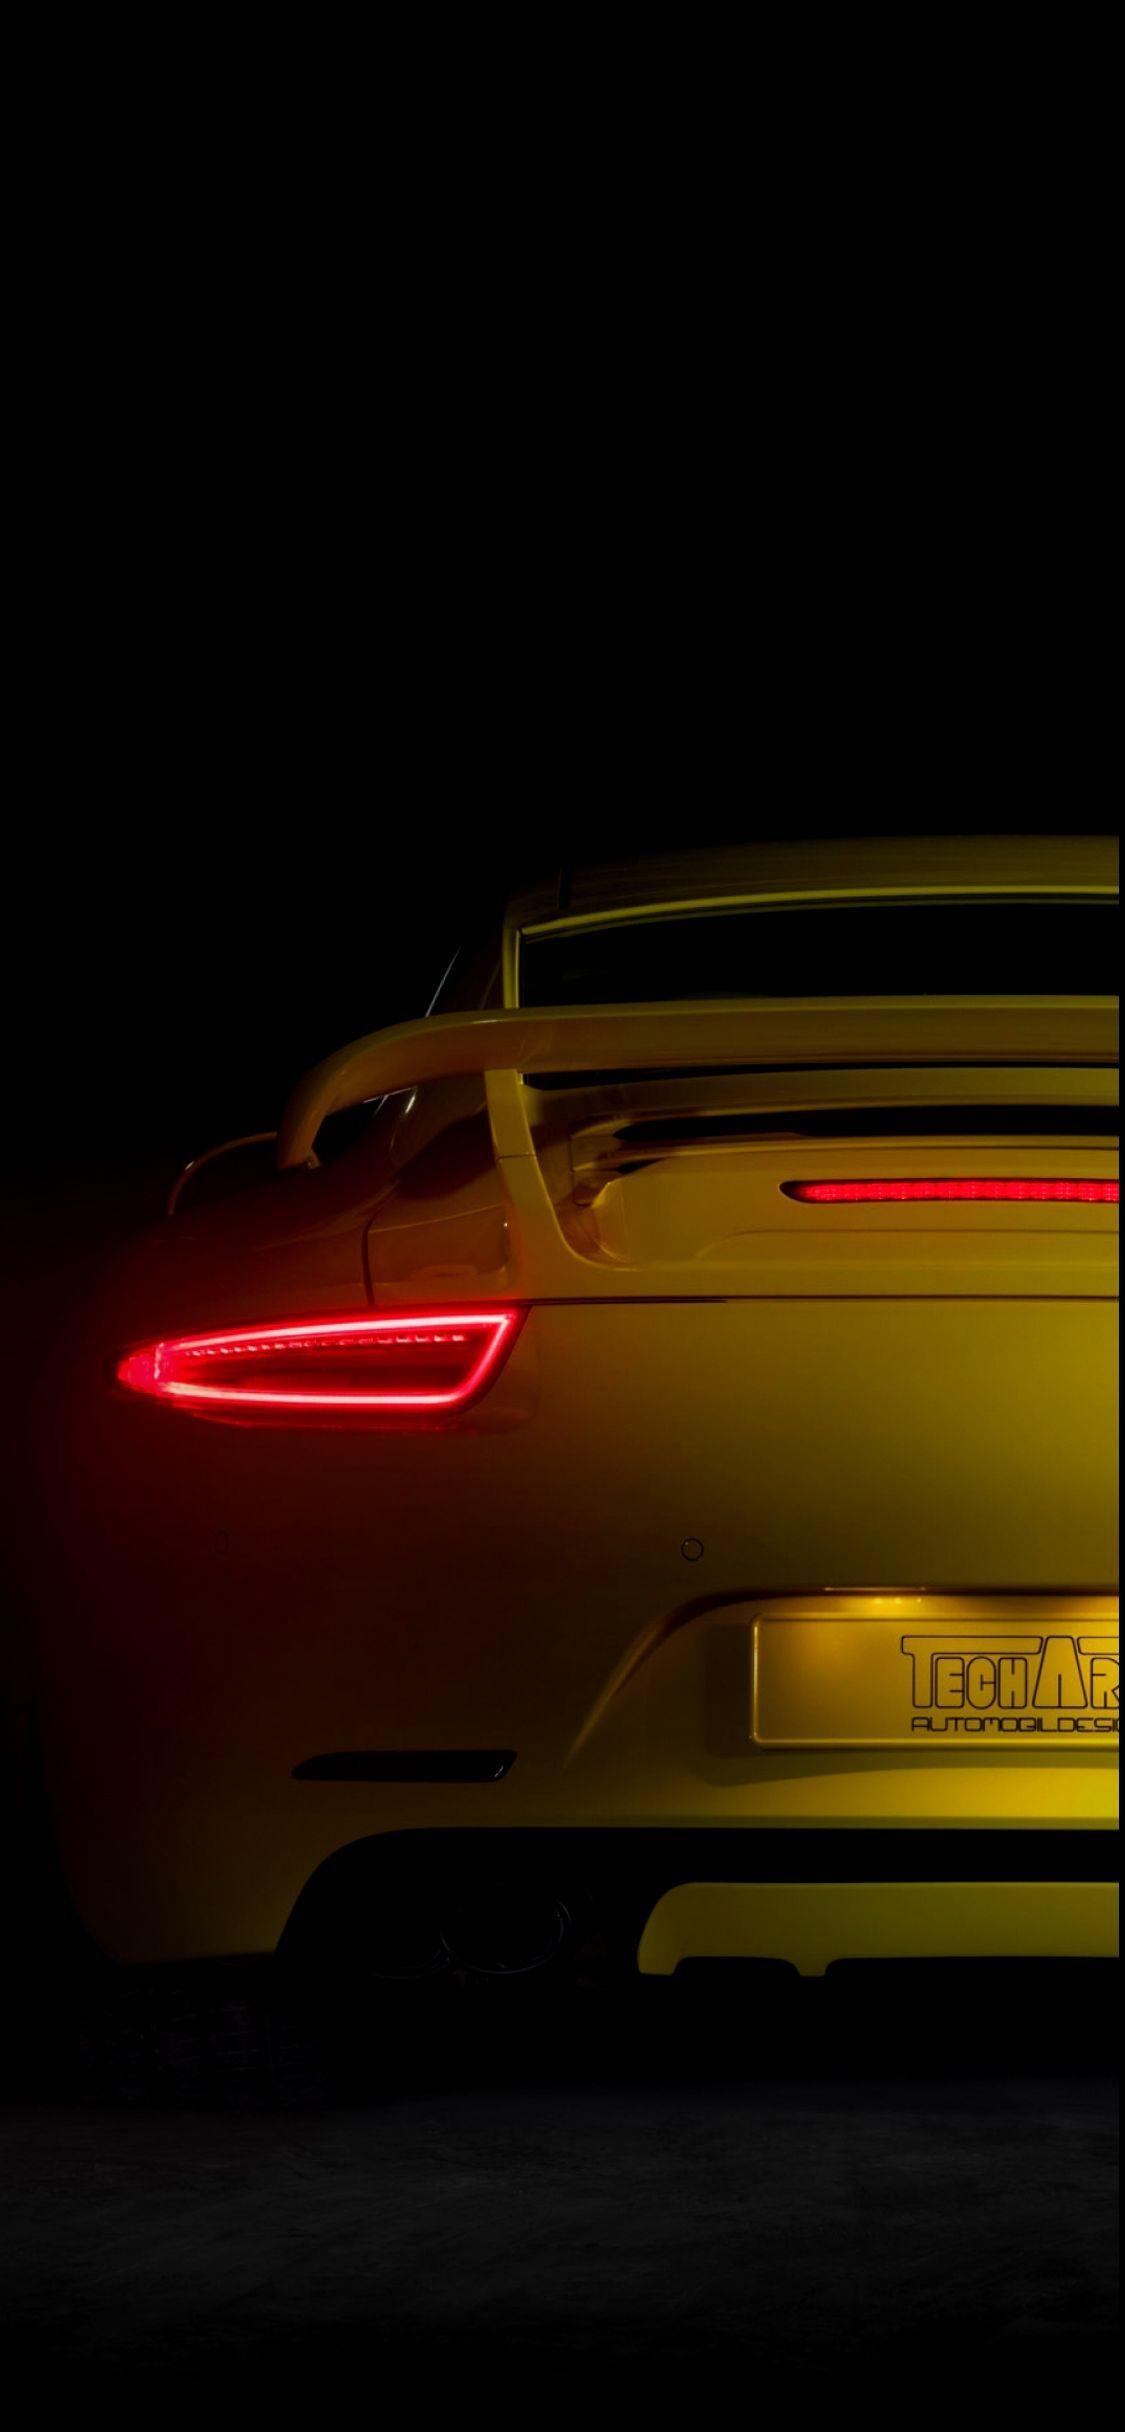 Iphone Xr Wallpaper 4k Car Iphone Wallpaper Yellow Porsche Iphone Wallpaper Mustang Iphone Wallpaper